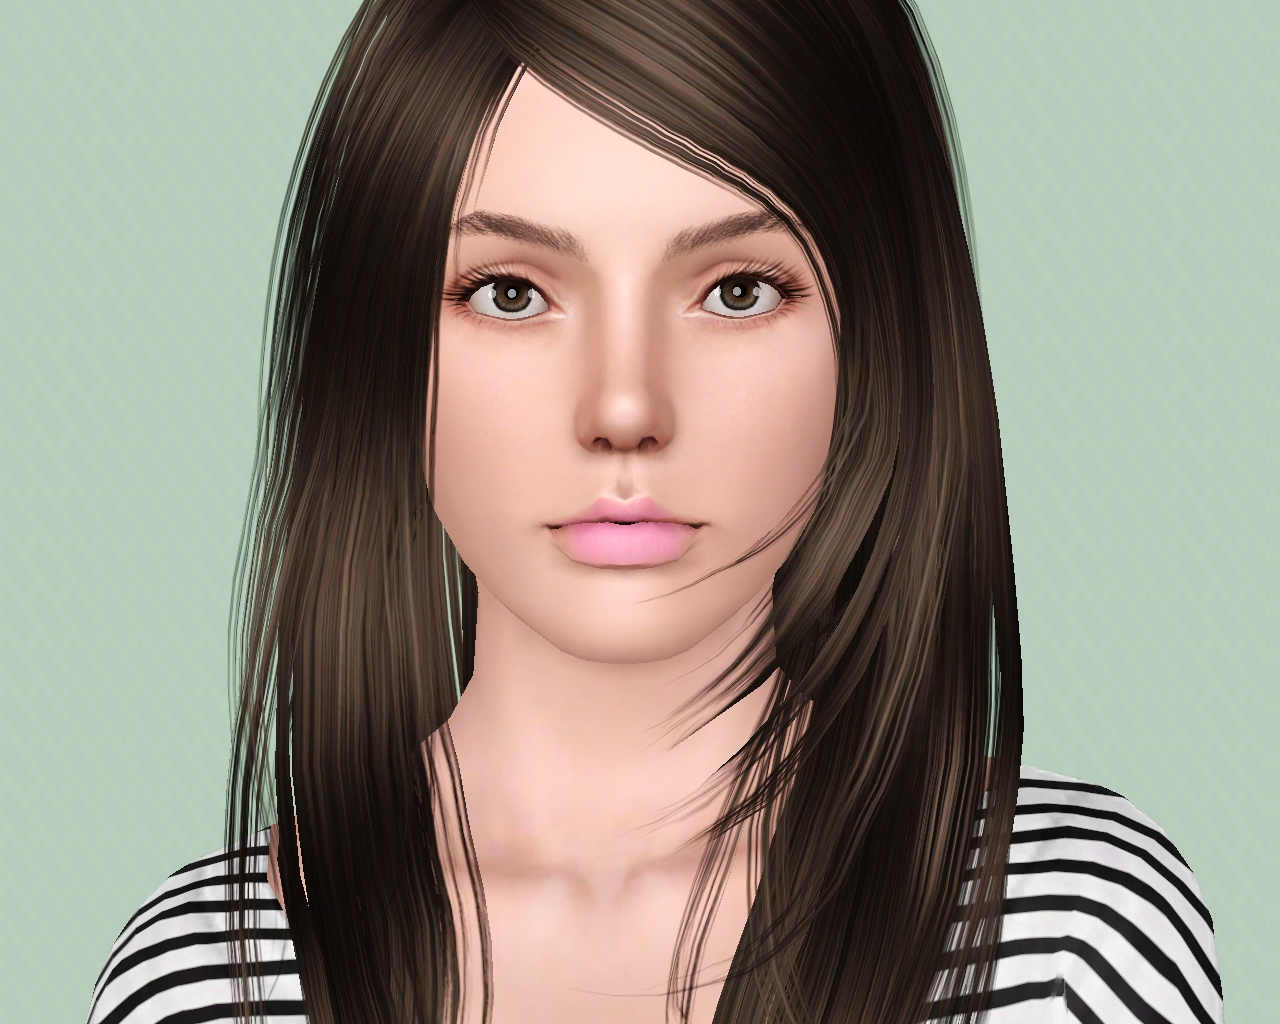 Liliana model preview mejor conjunto de frases apexwallpapers com